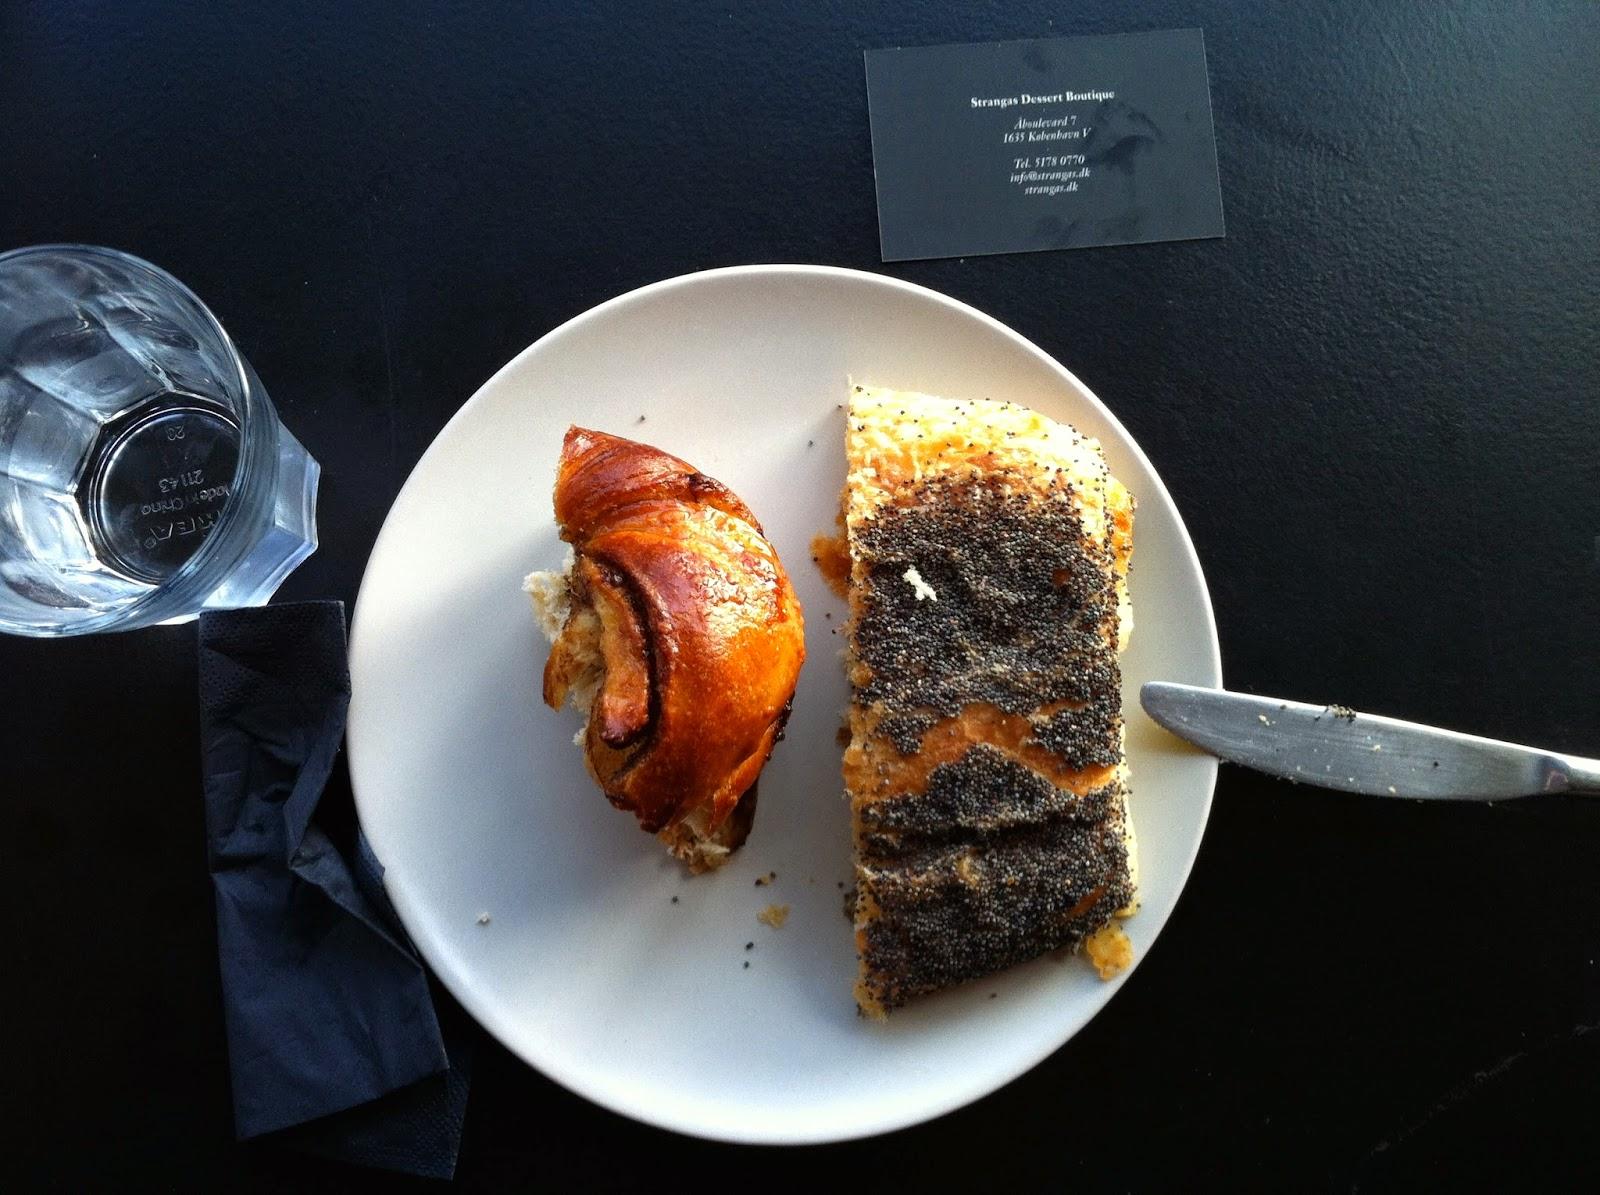 Strangas Dessert Boutique in Copenhagen was delicious